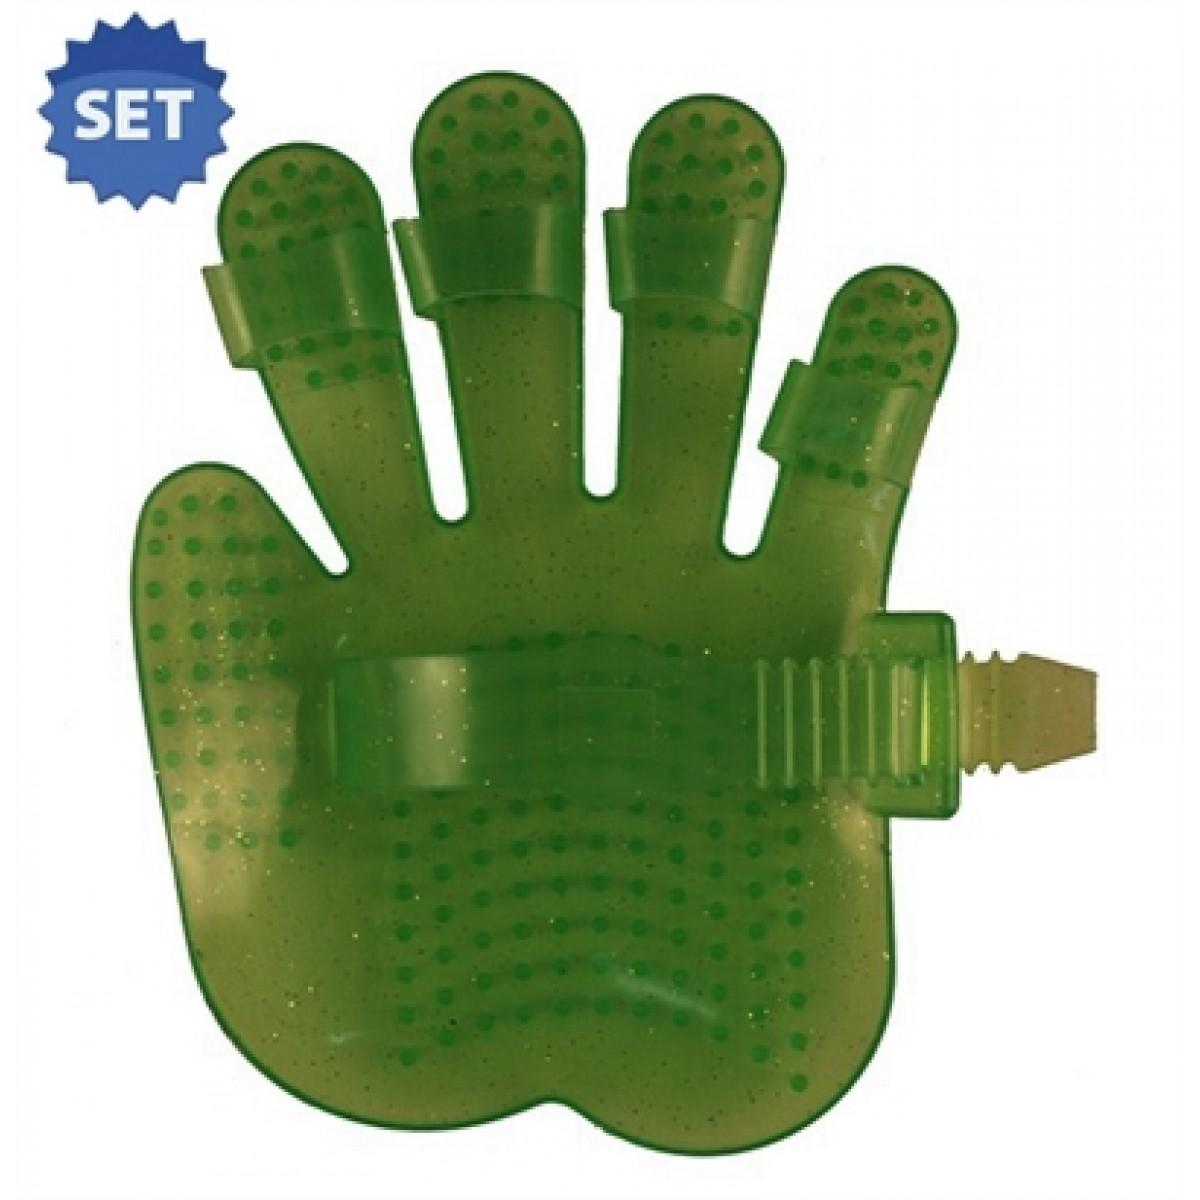 Håndskåret Gnubber Fair Play 13x18cm grøn